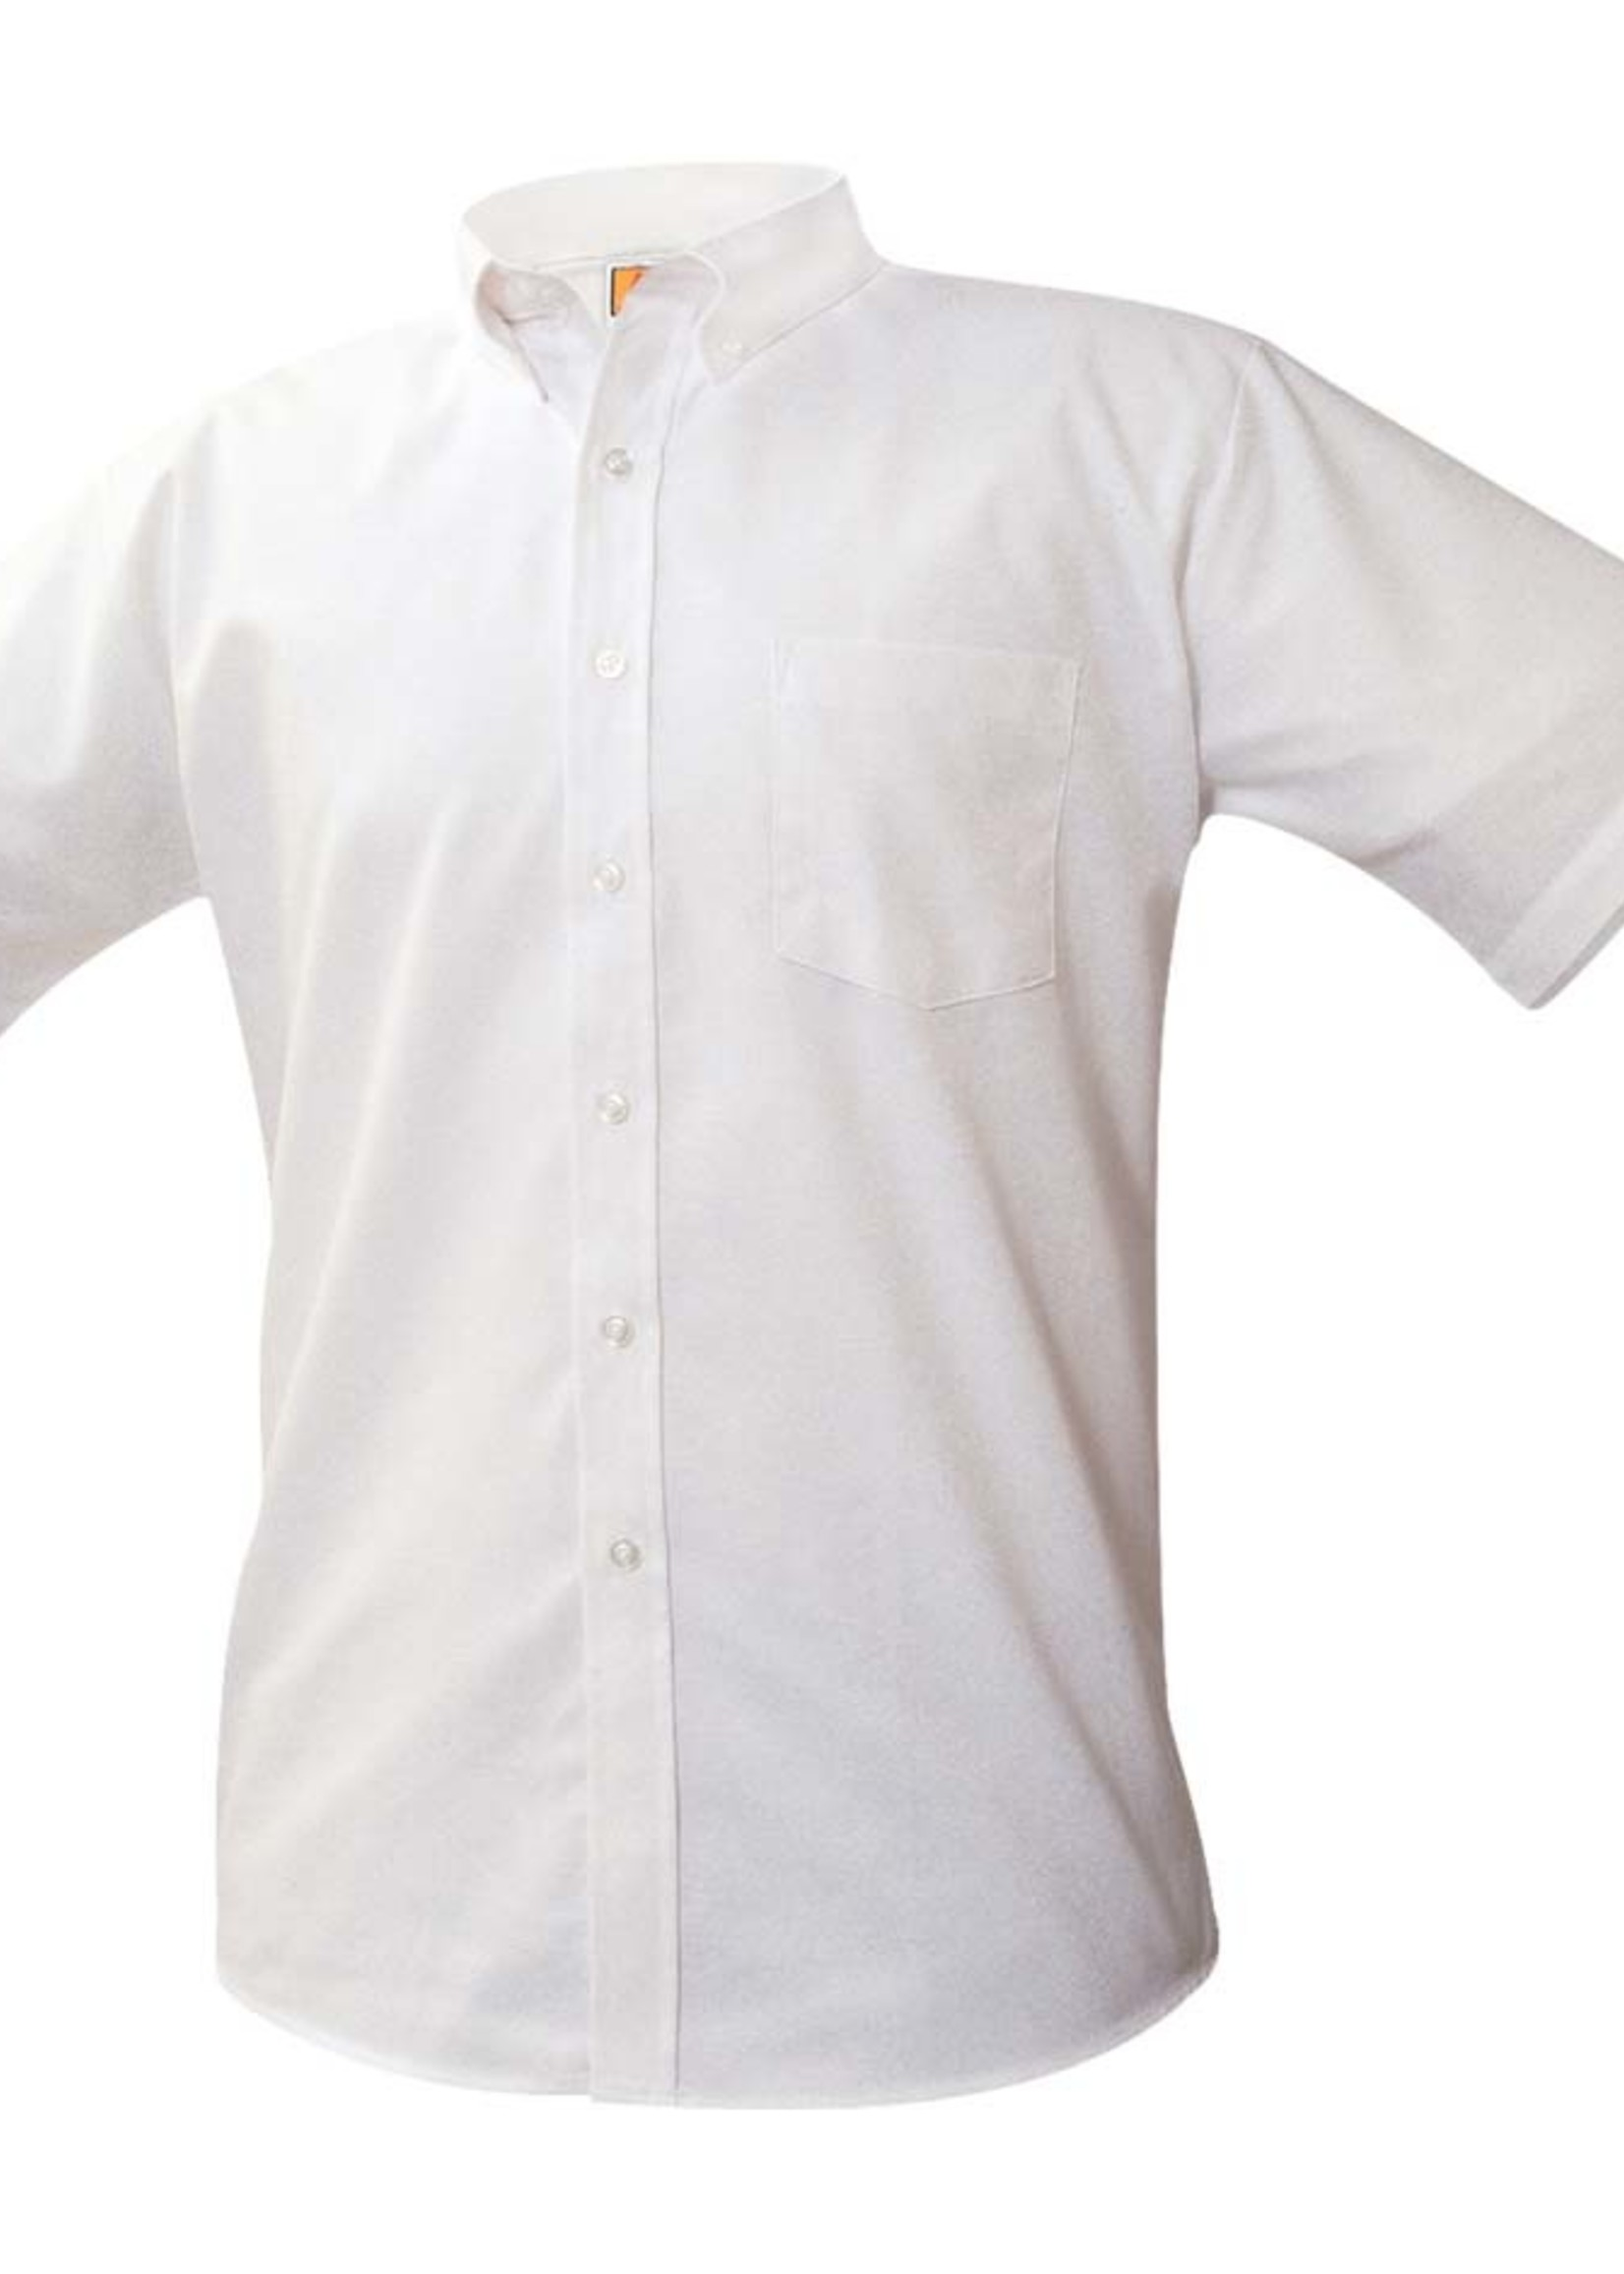 TUS SPX White Short Sleeve Oxford Shirt